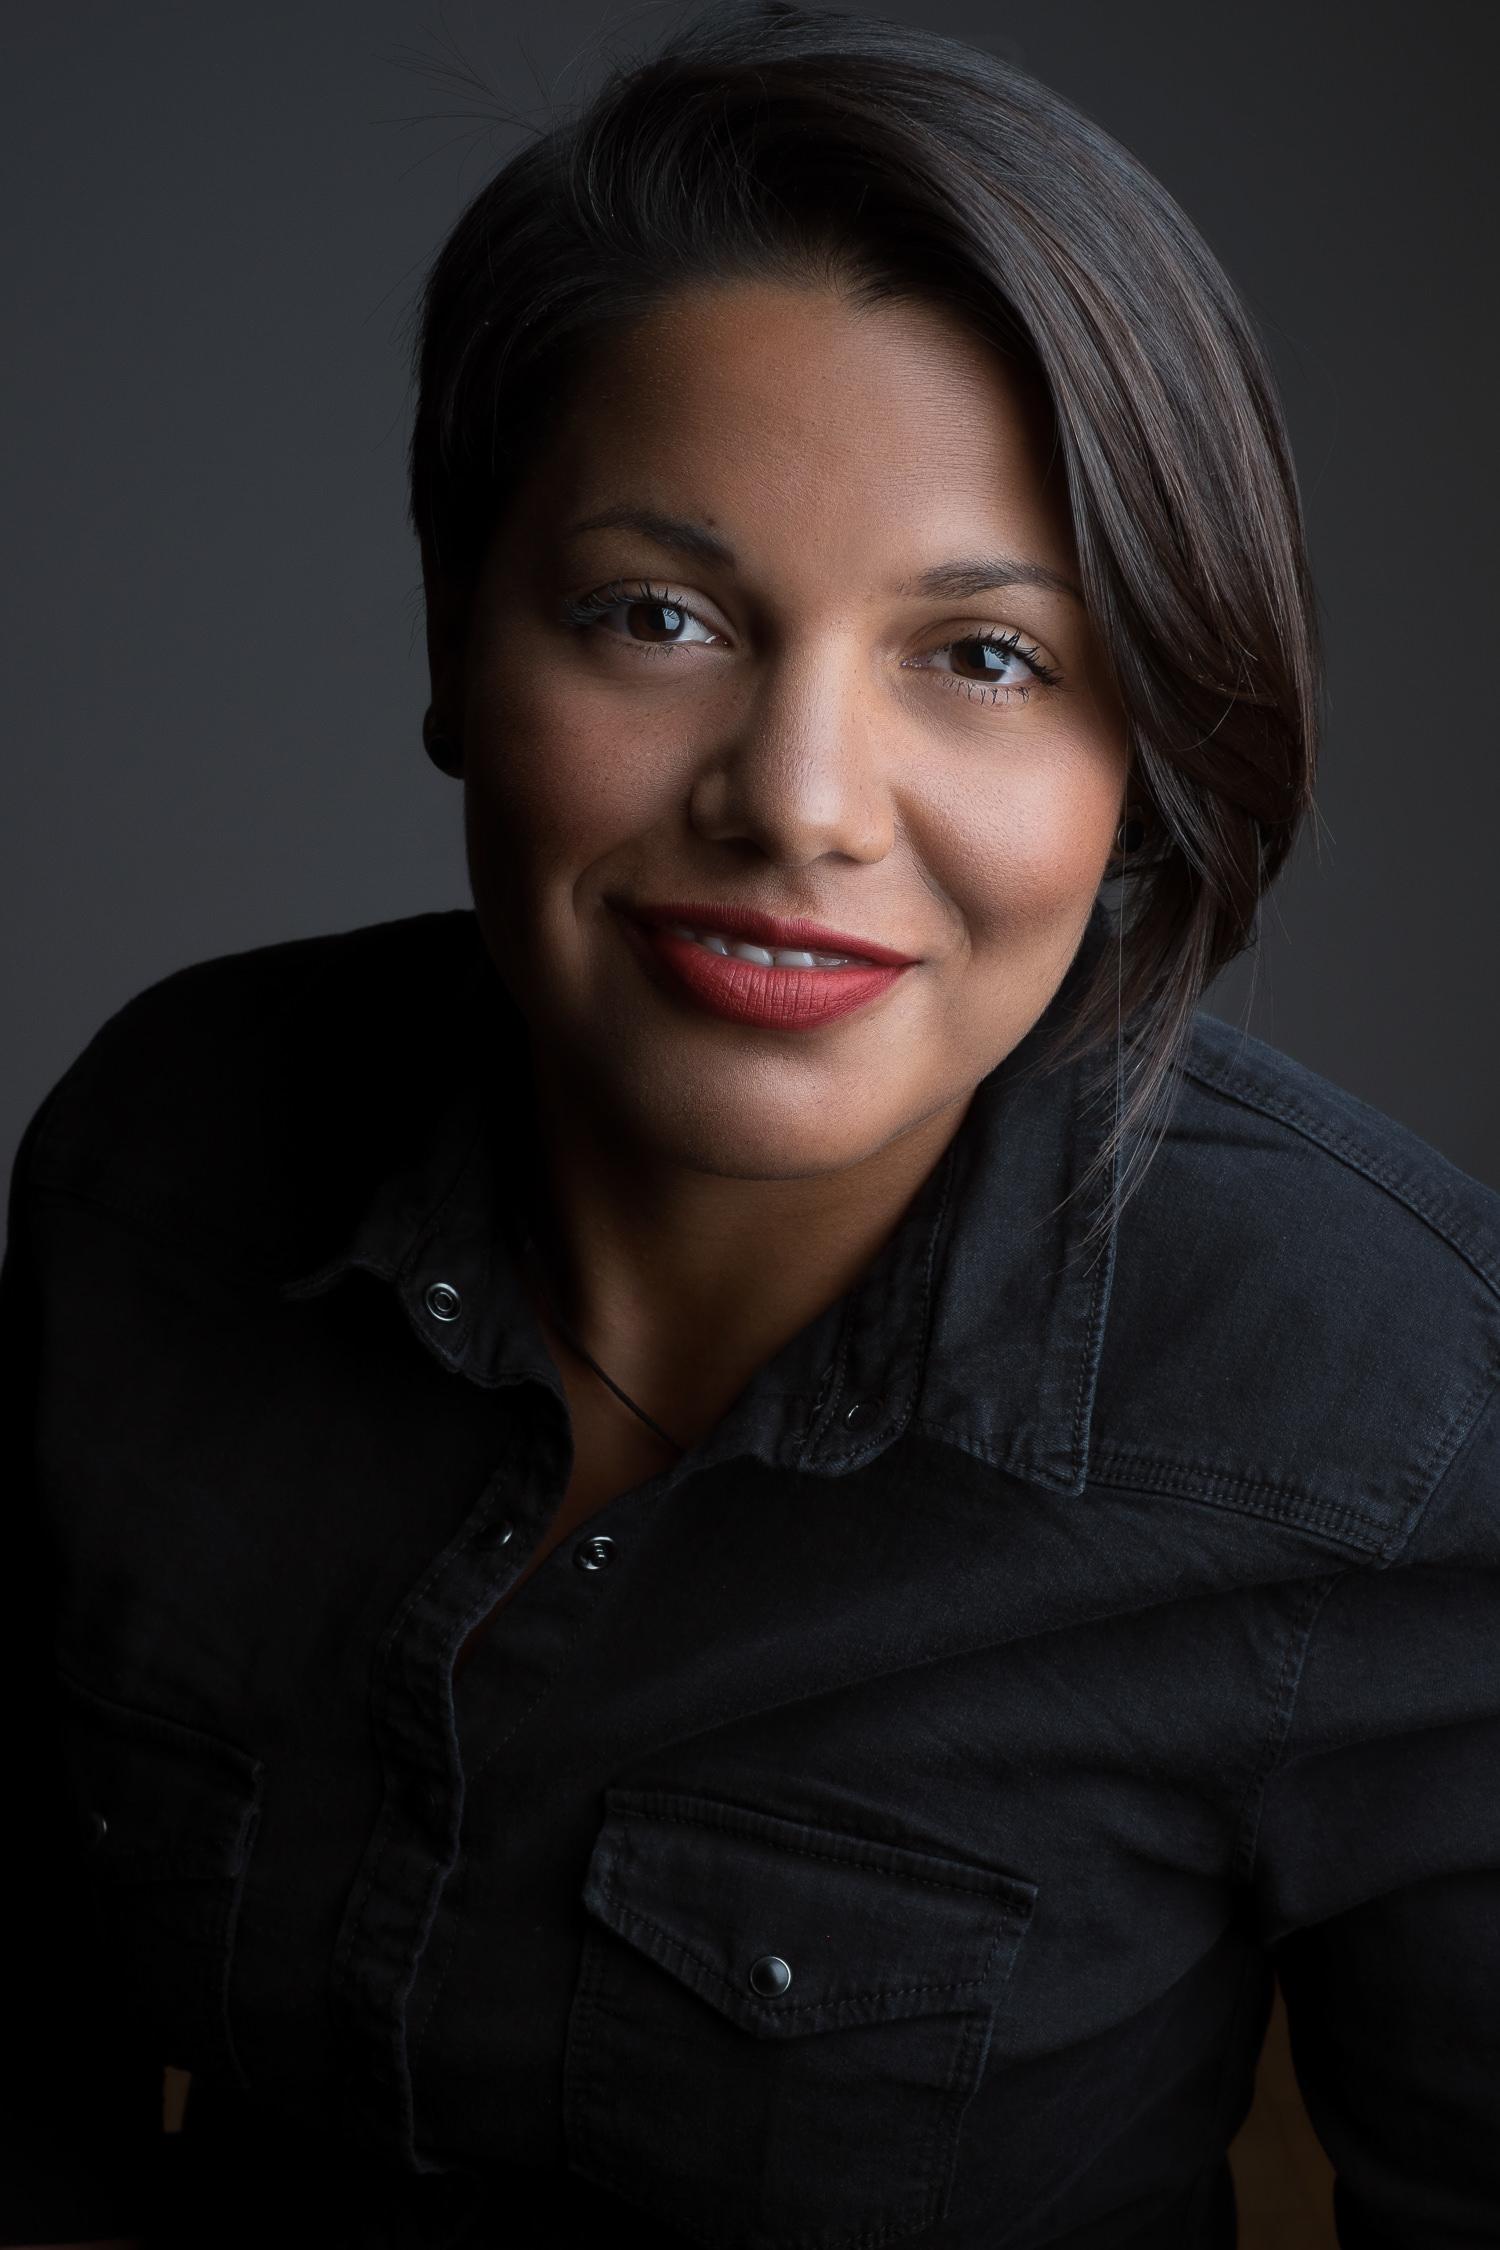 diana-valencia-amsterdam-headshot-portrait-portret-bedrijf-zakelijk-mark-hadden-photographer-fotograaf-105.jpg